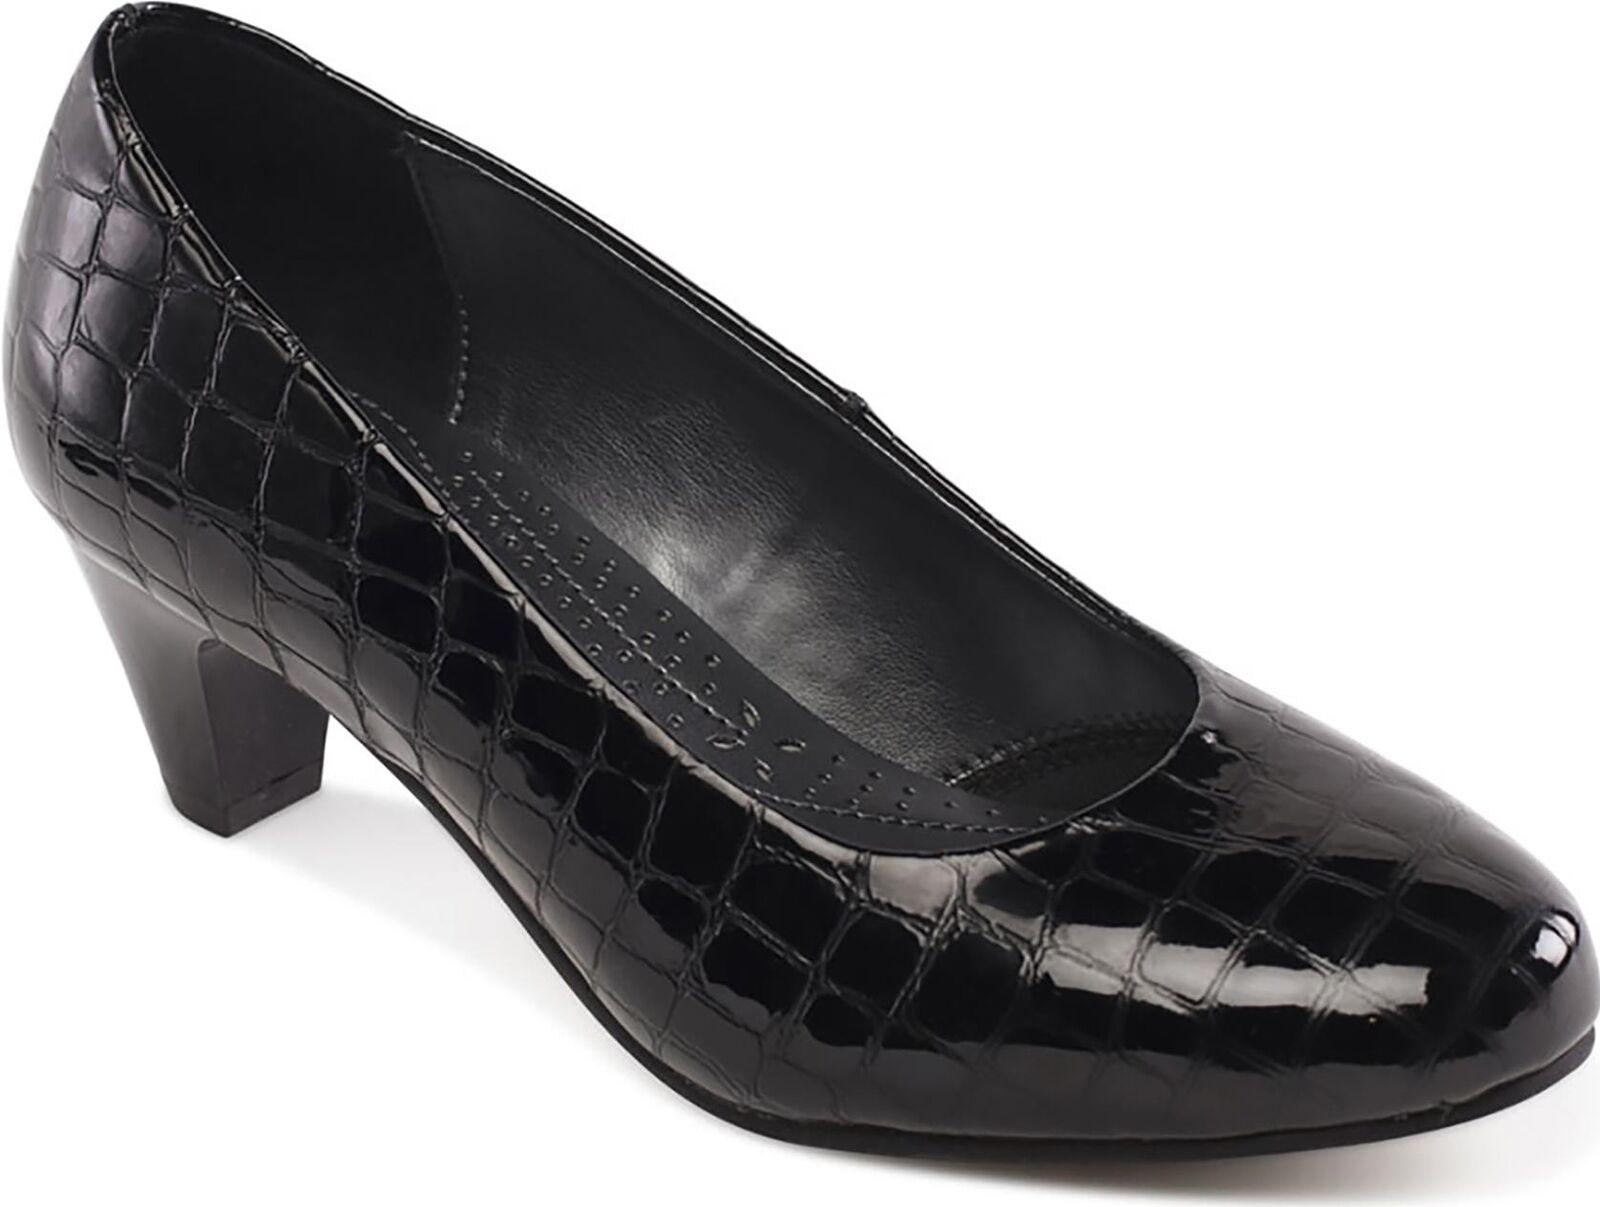 Padders Jane señoras para mujer de cuero extra extra extra ancho (2E) Tribunal Zapatos Negro Patente Croc  Venta barata